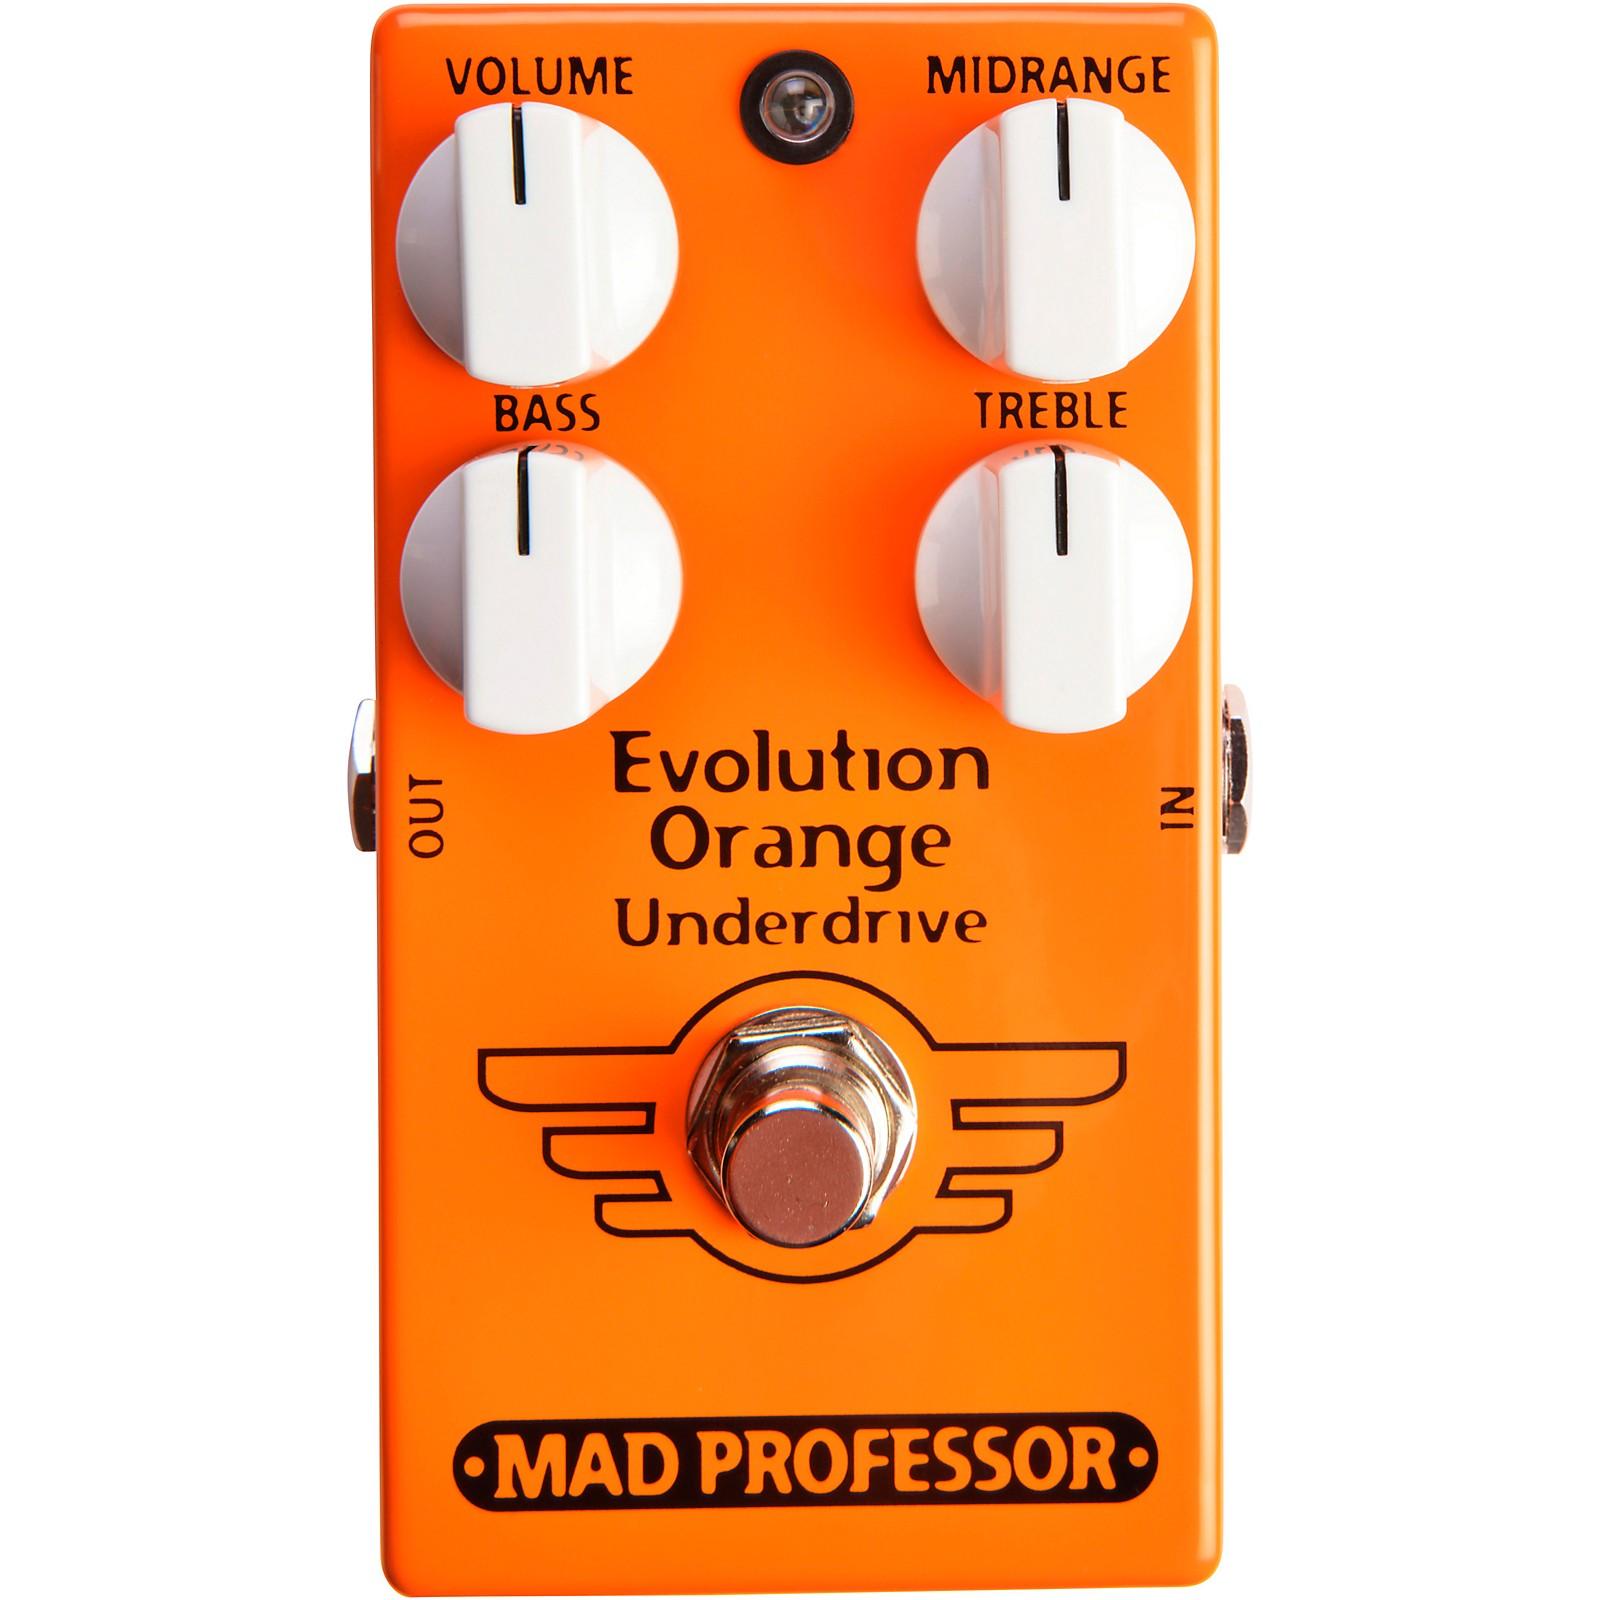 Mad Professor Evolution Orange Underdrive Effects Pedal